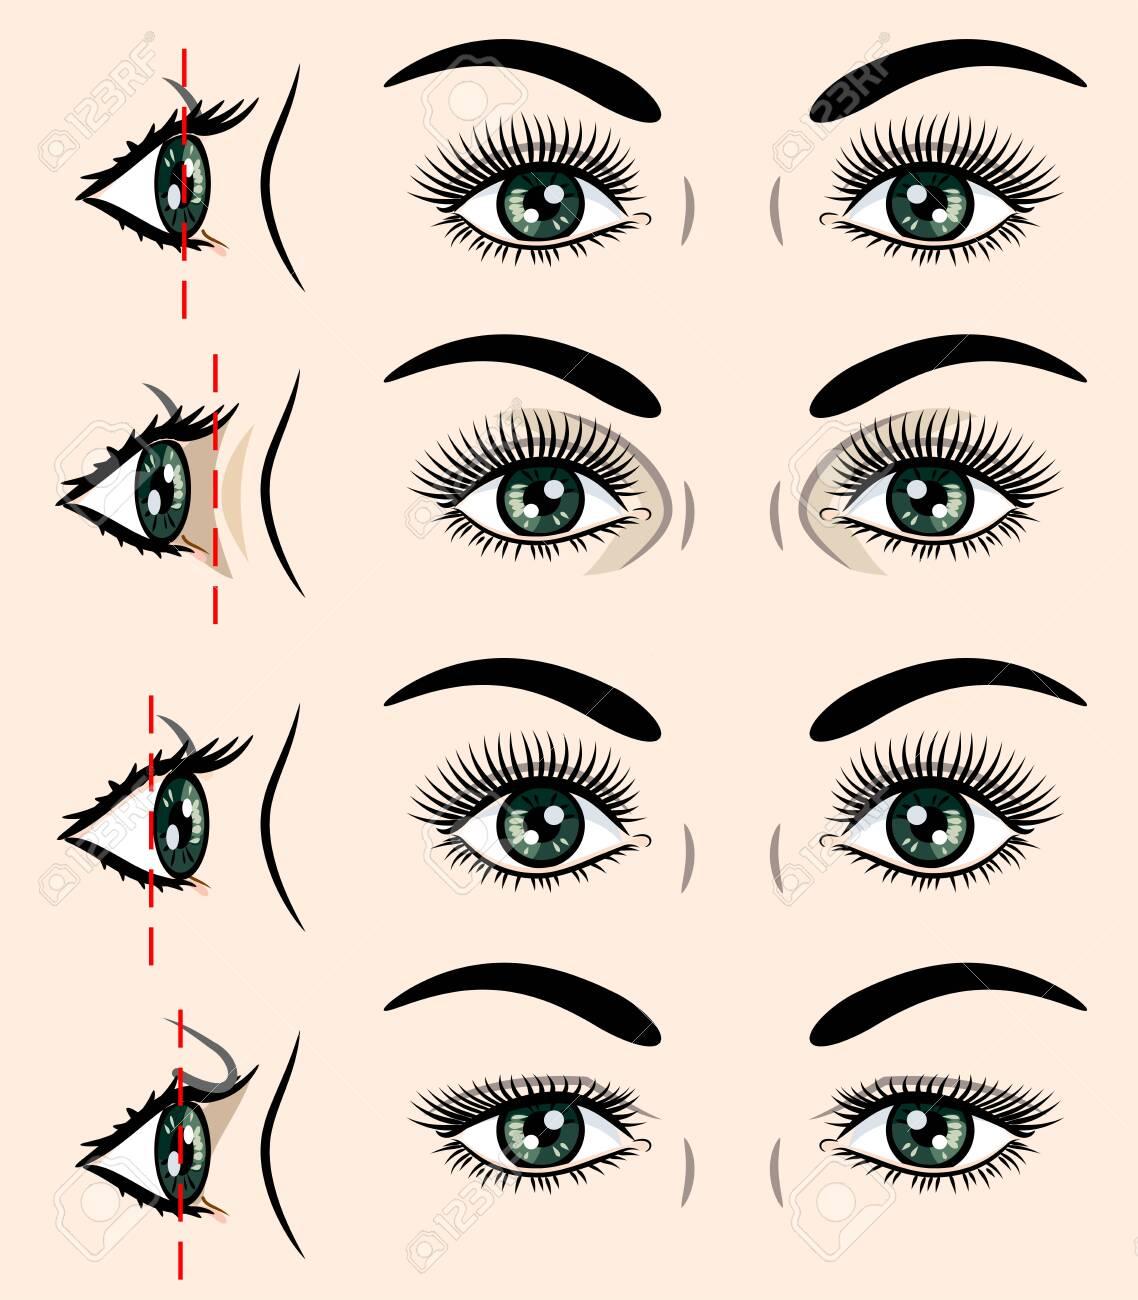 Various forms of human eyes - 130800607